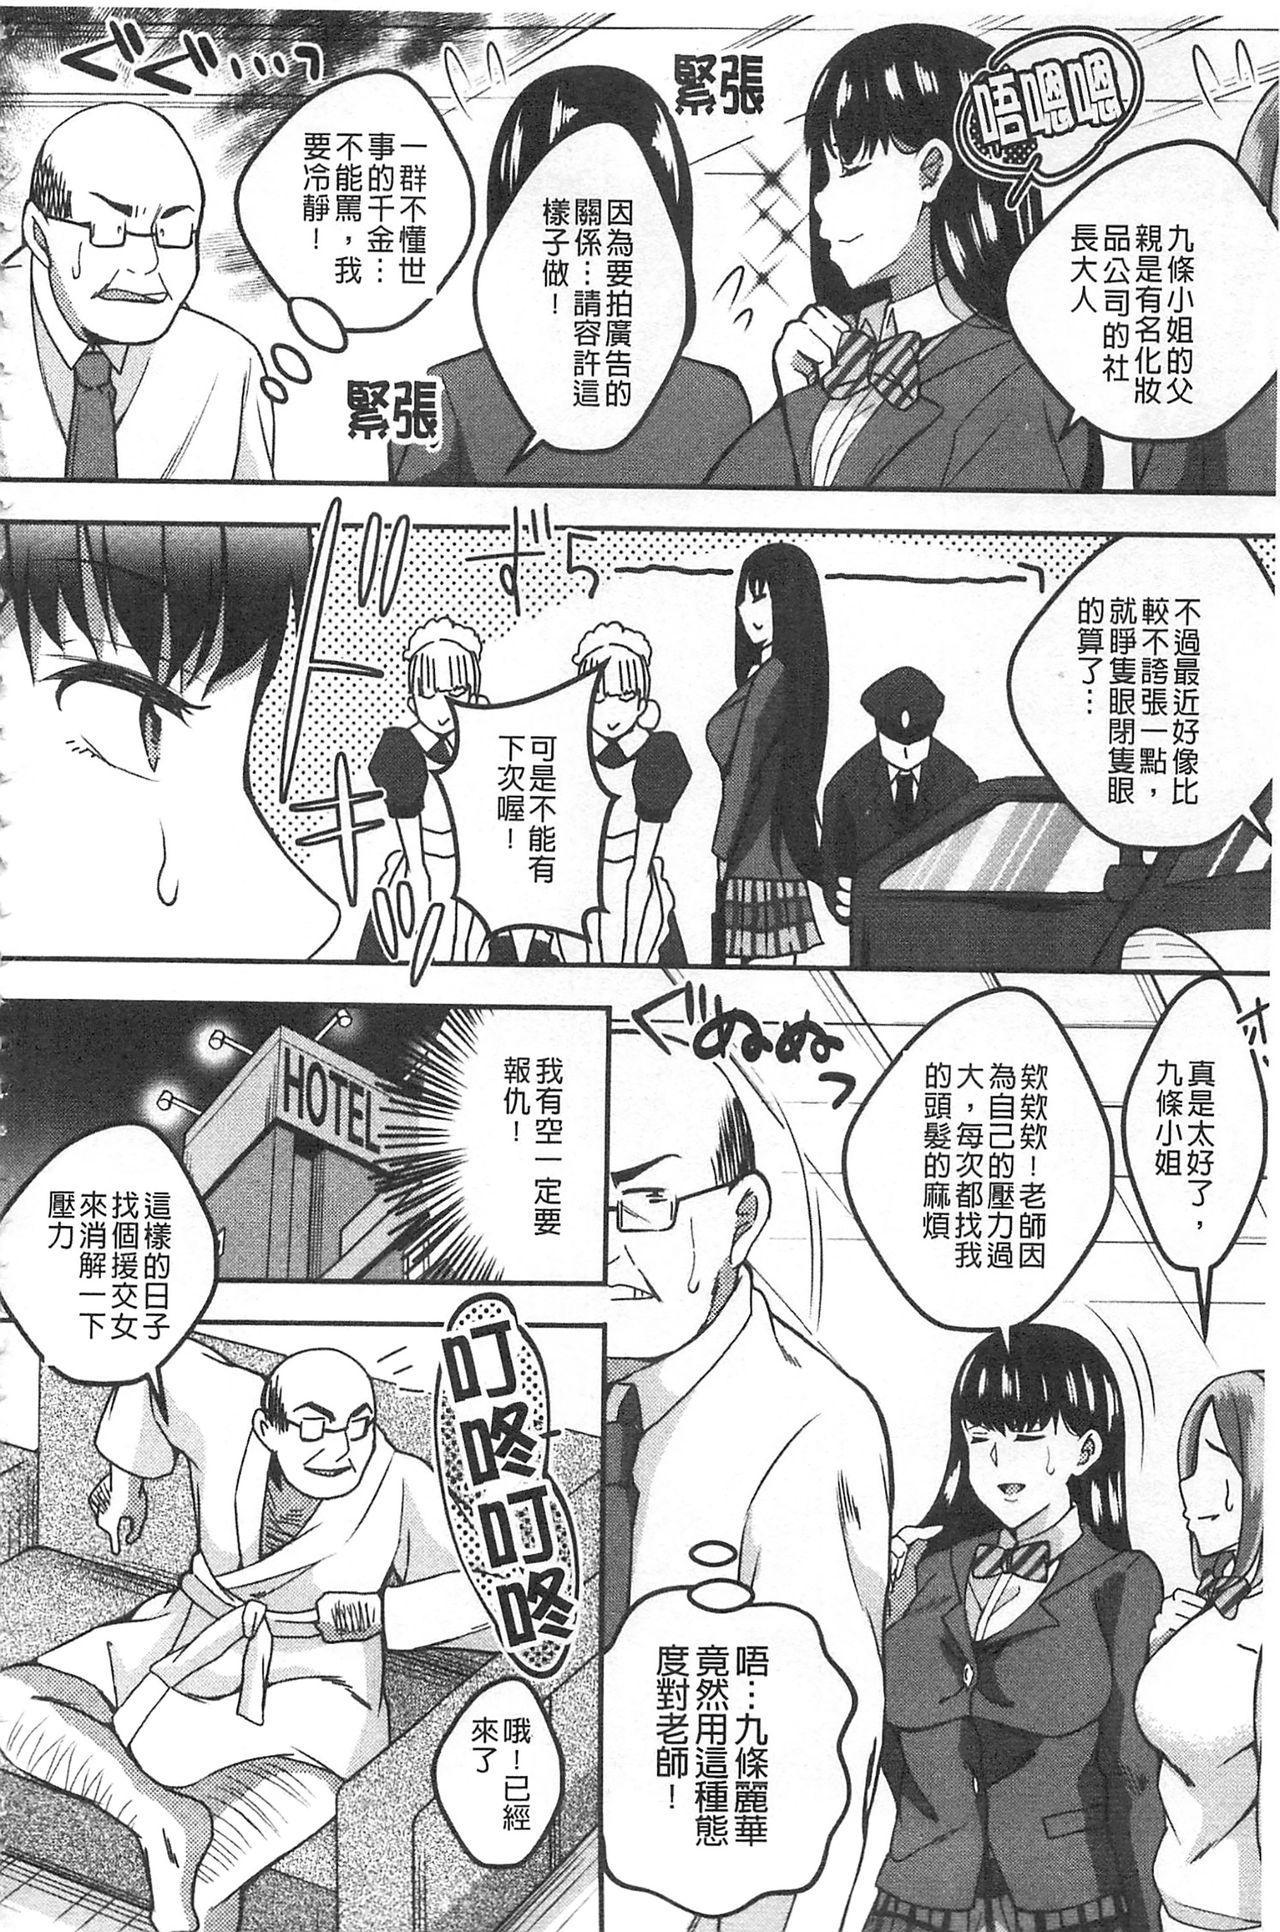 Kanjuku Otome no Odoshikata | 姦熟乙女的脅迫法 47